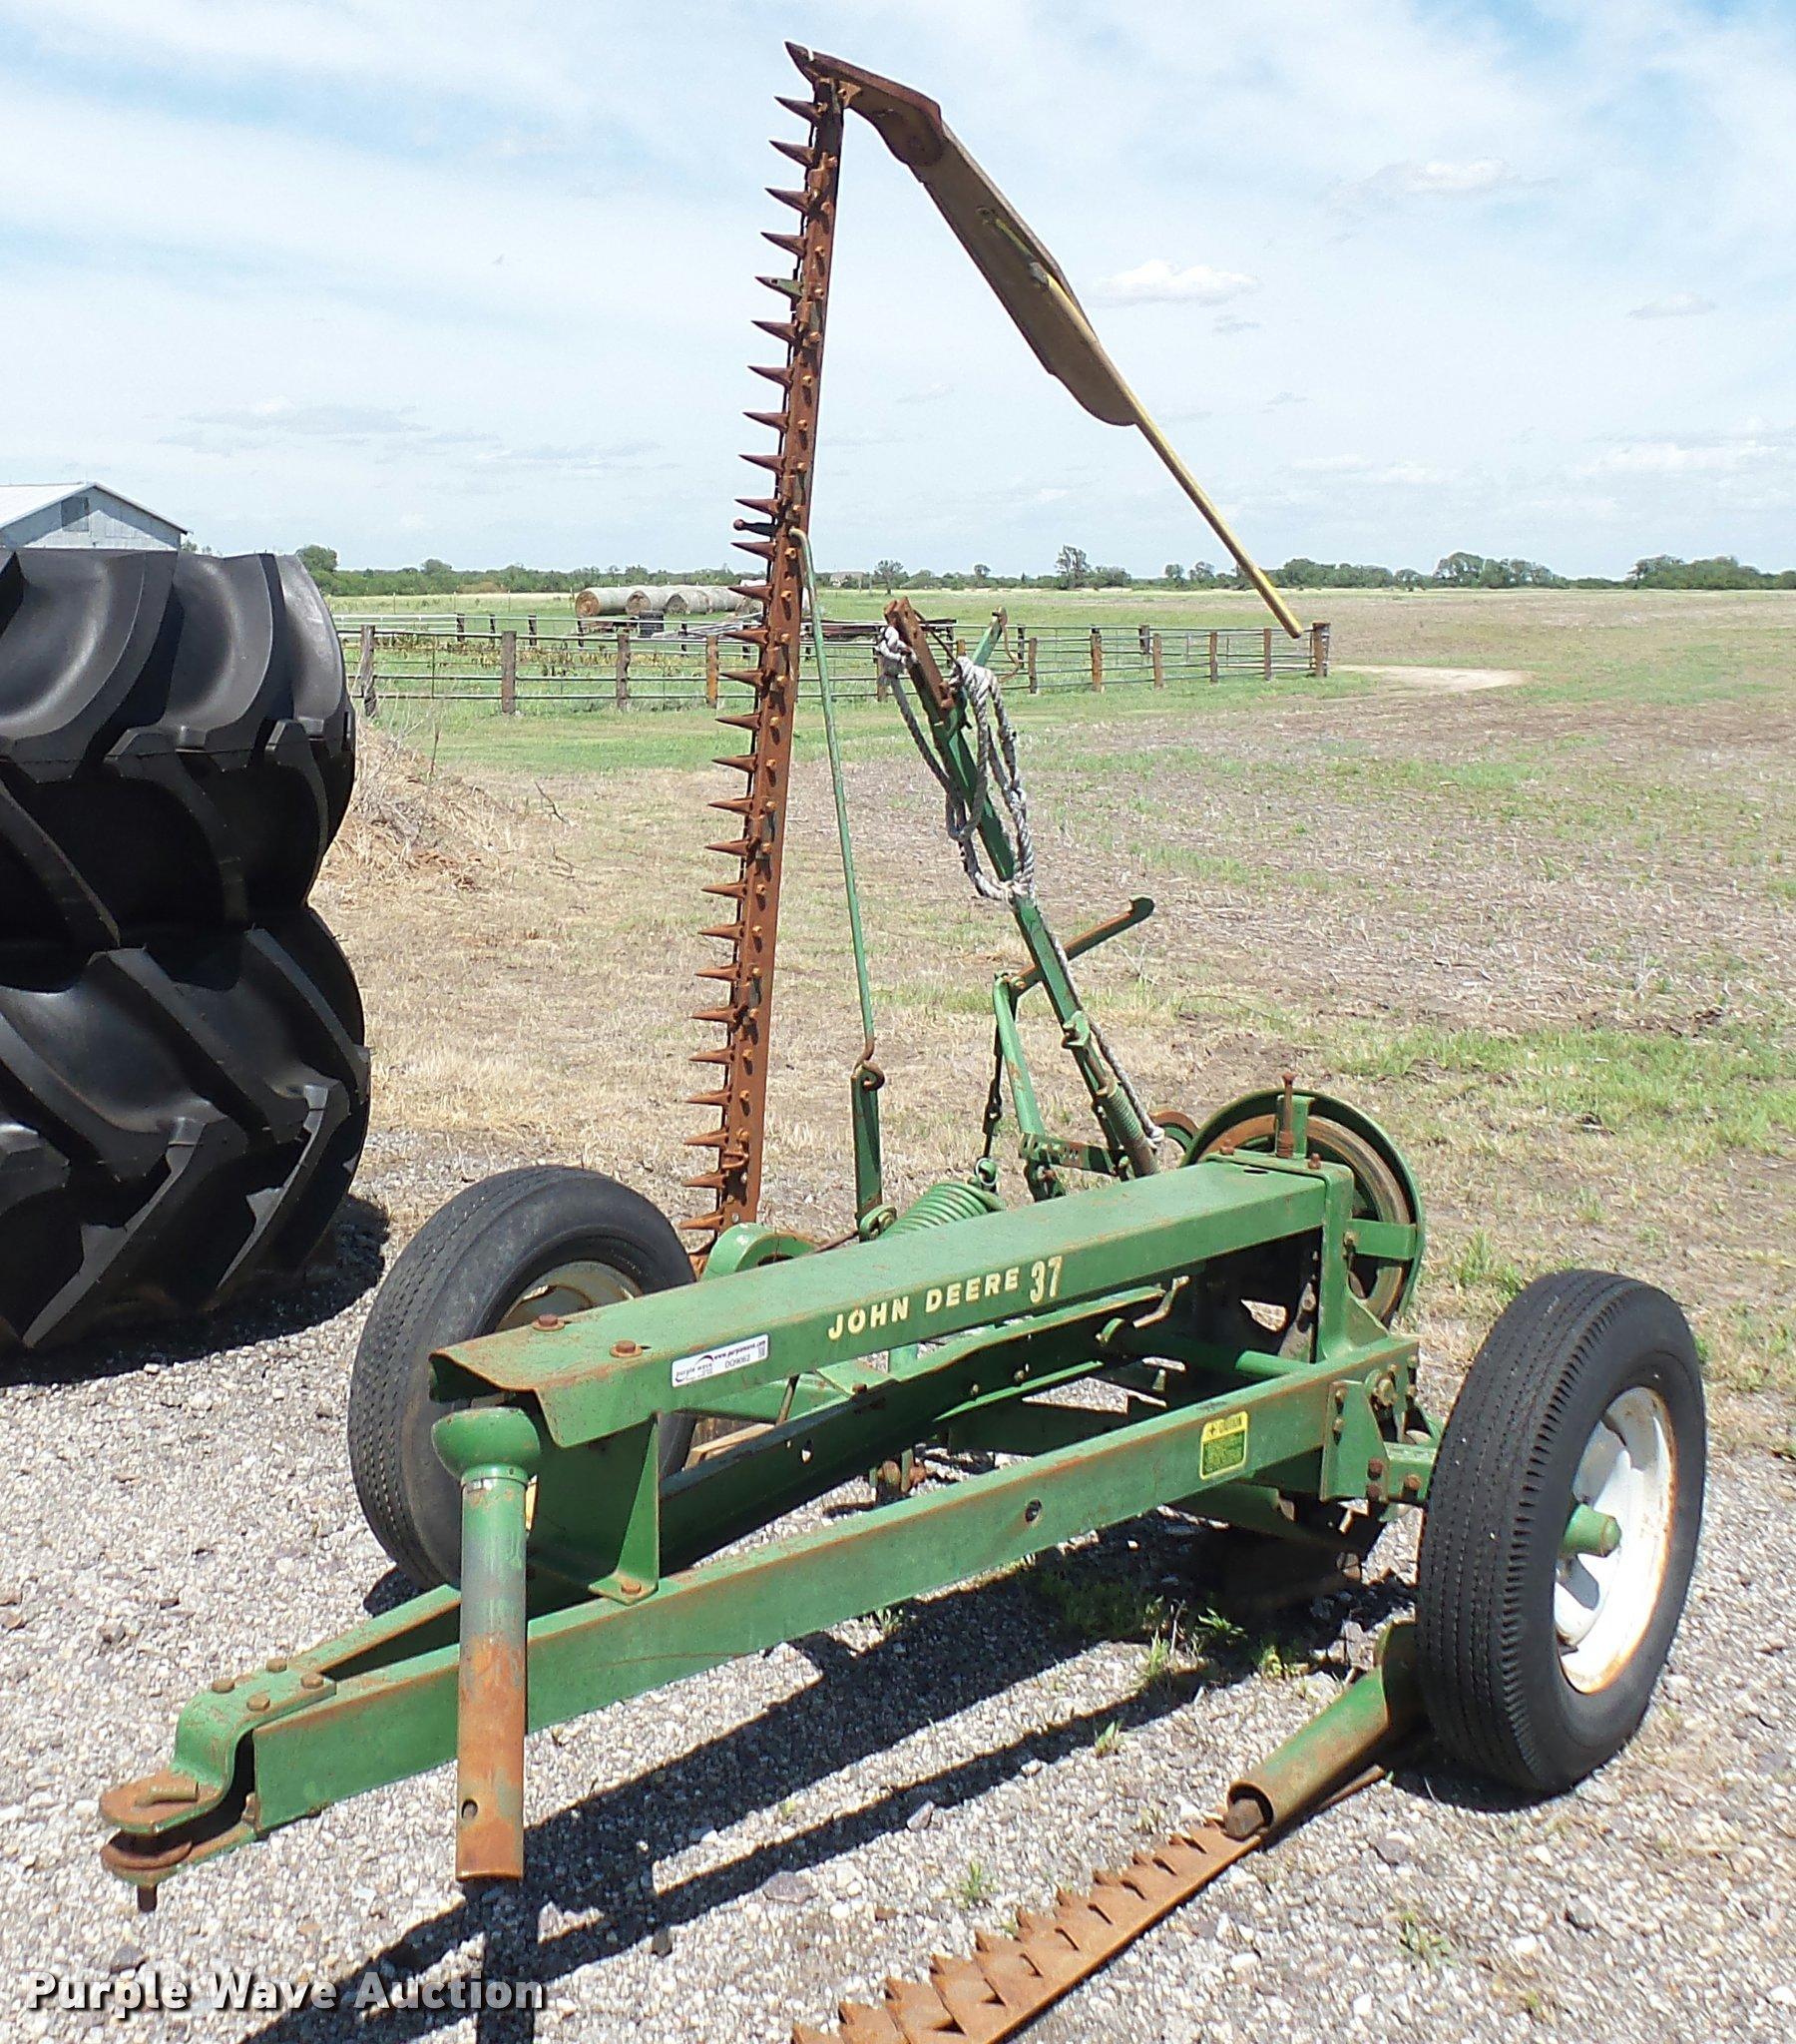 John Deere 37 sickle mower | Item DQ9062 | SOLD! June 14 Ag